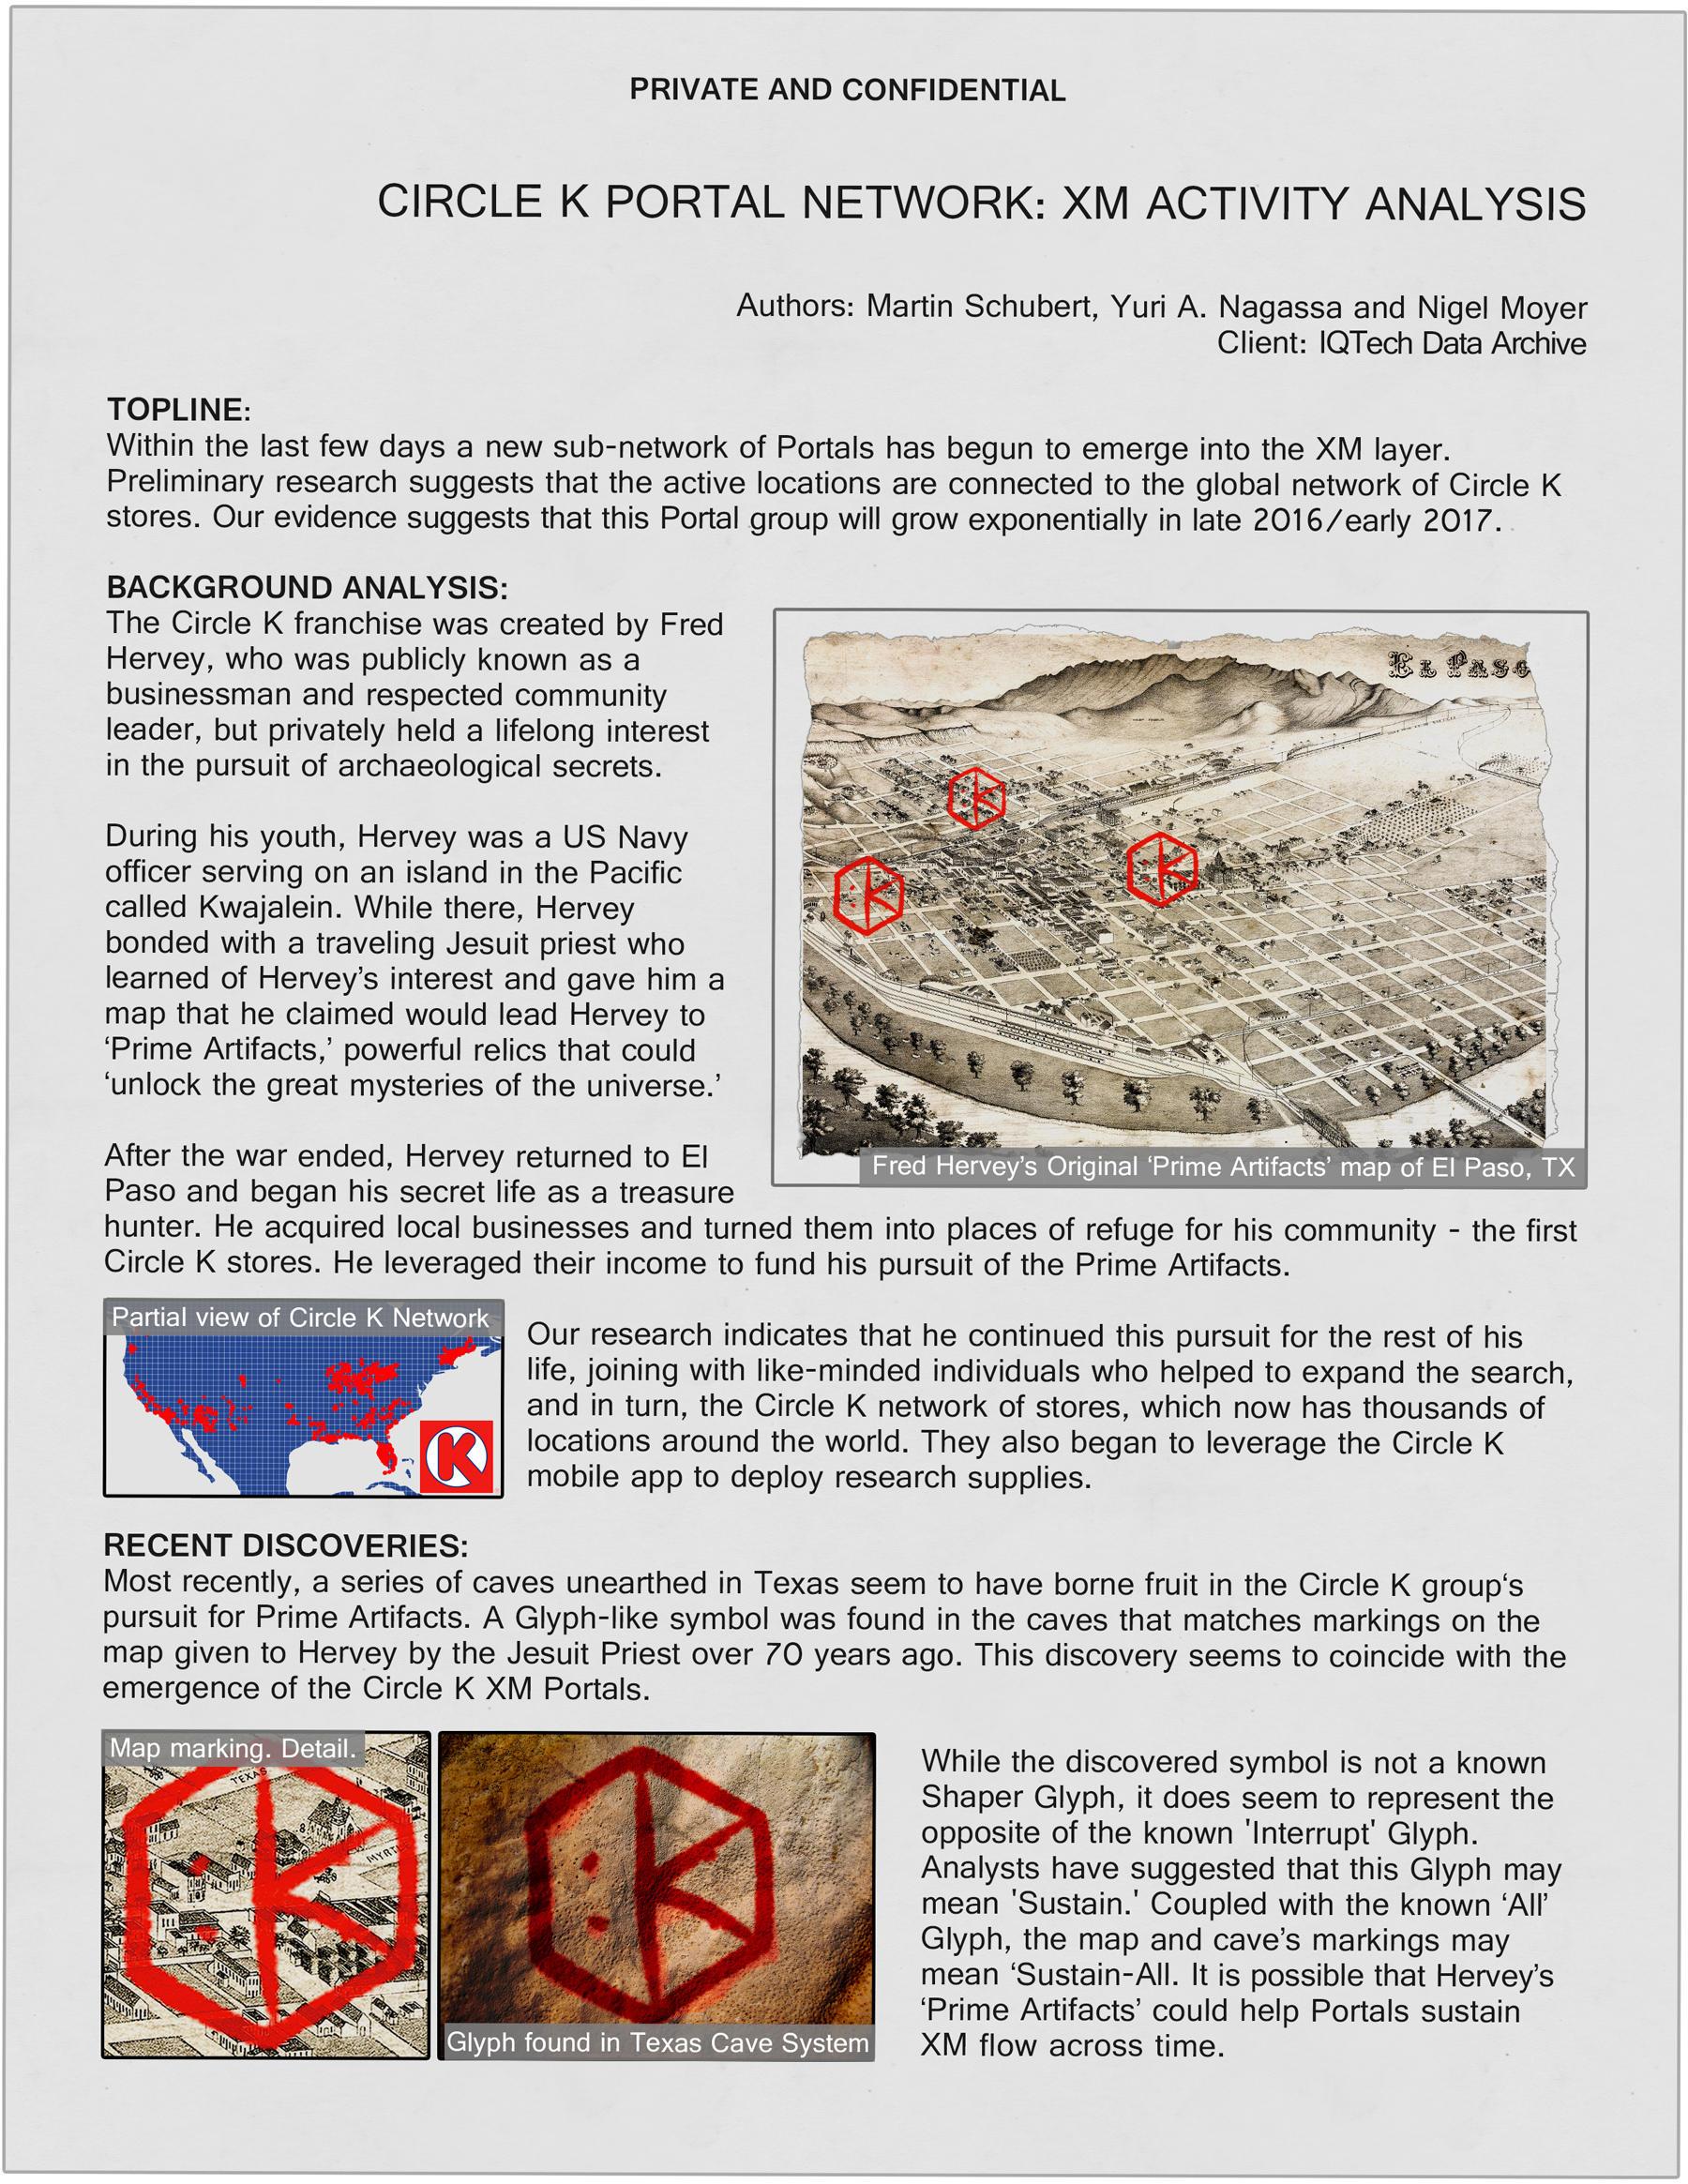 http://ingress.lycaeum.net/2016/09/Circle-K-unredacted.jpg